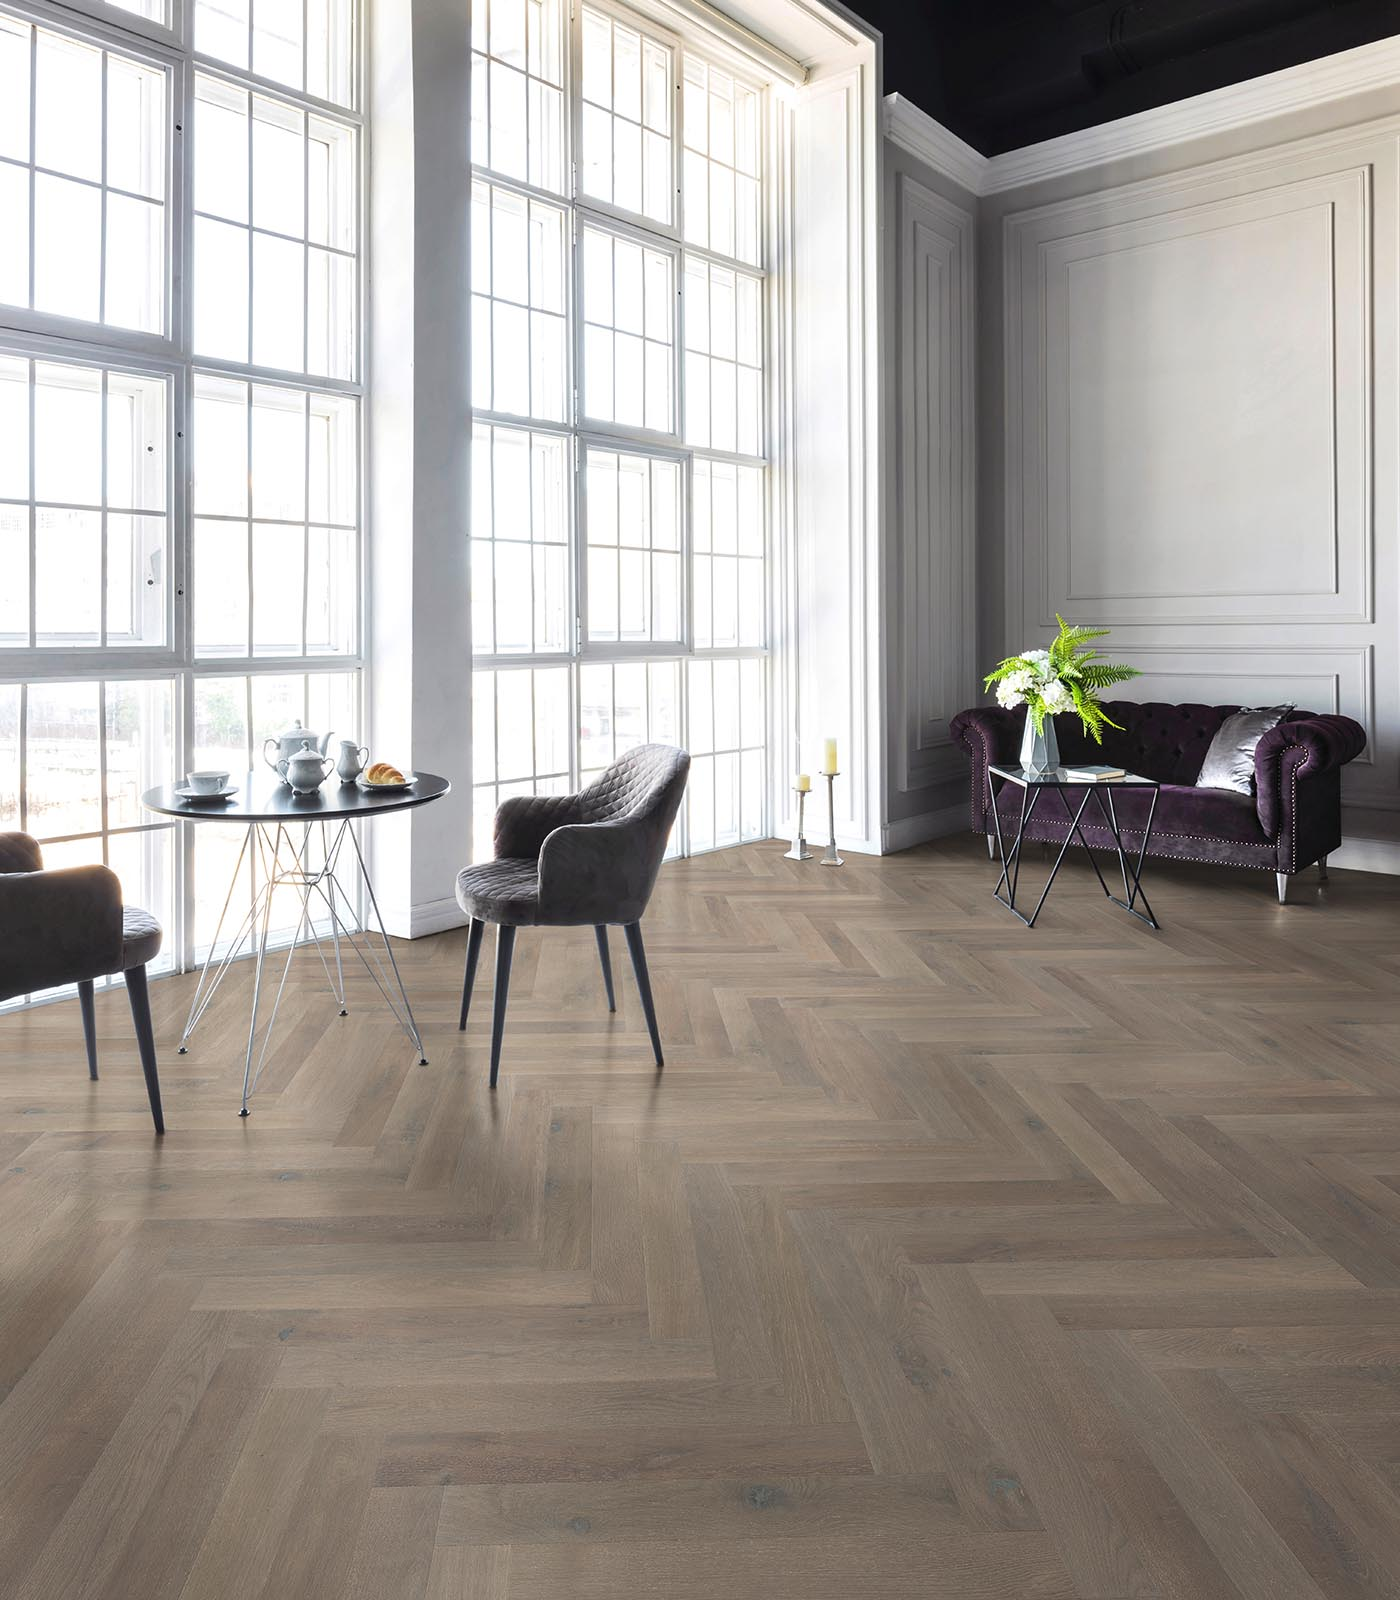 European Herringbone Oak Floors-Brittany-Fashion Collection-room